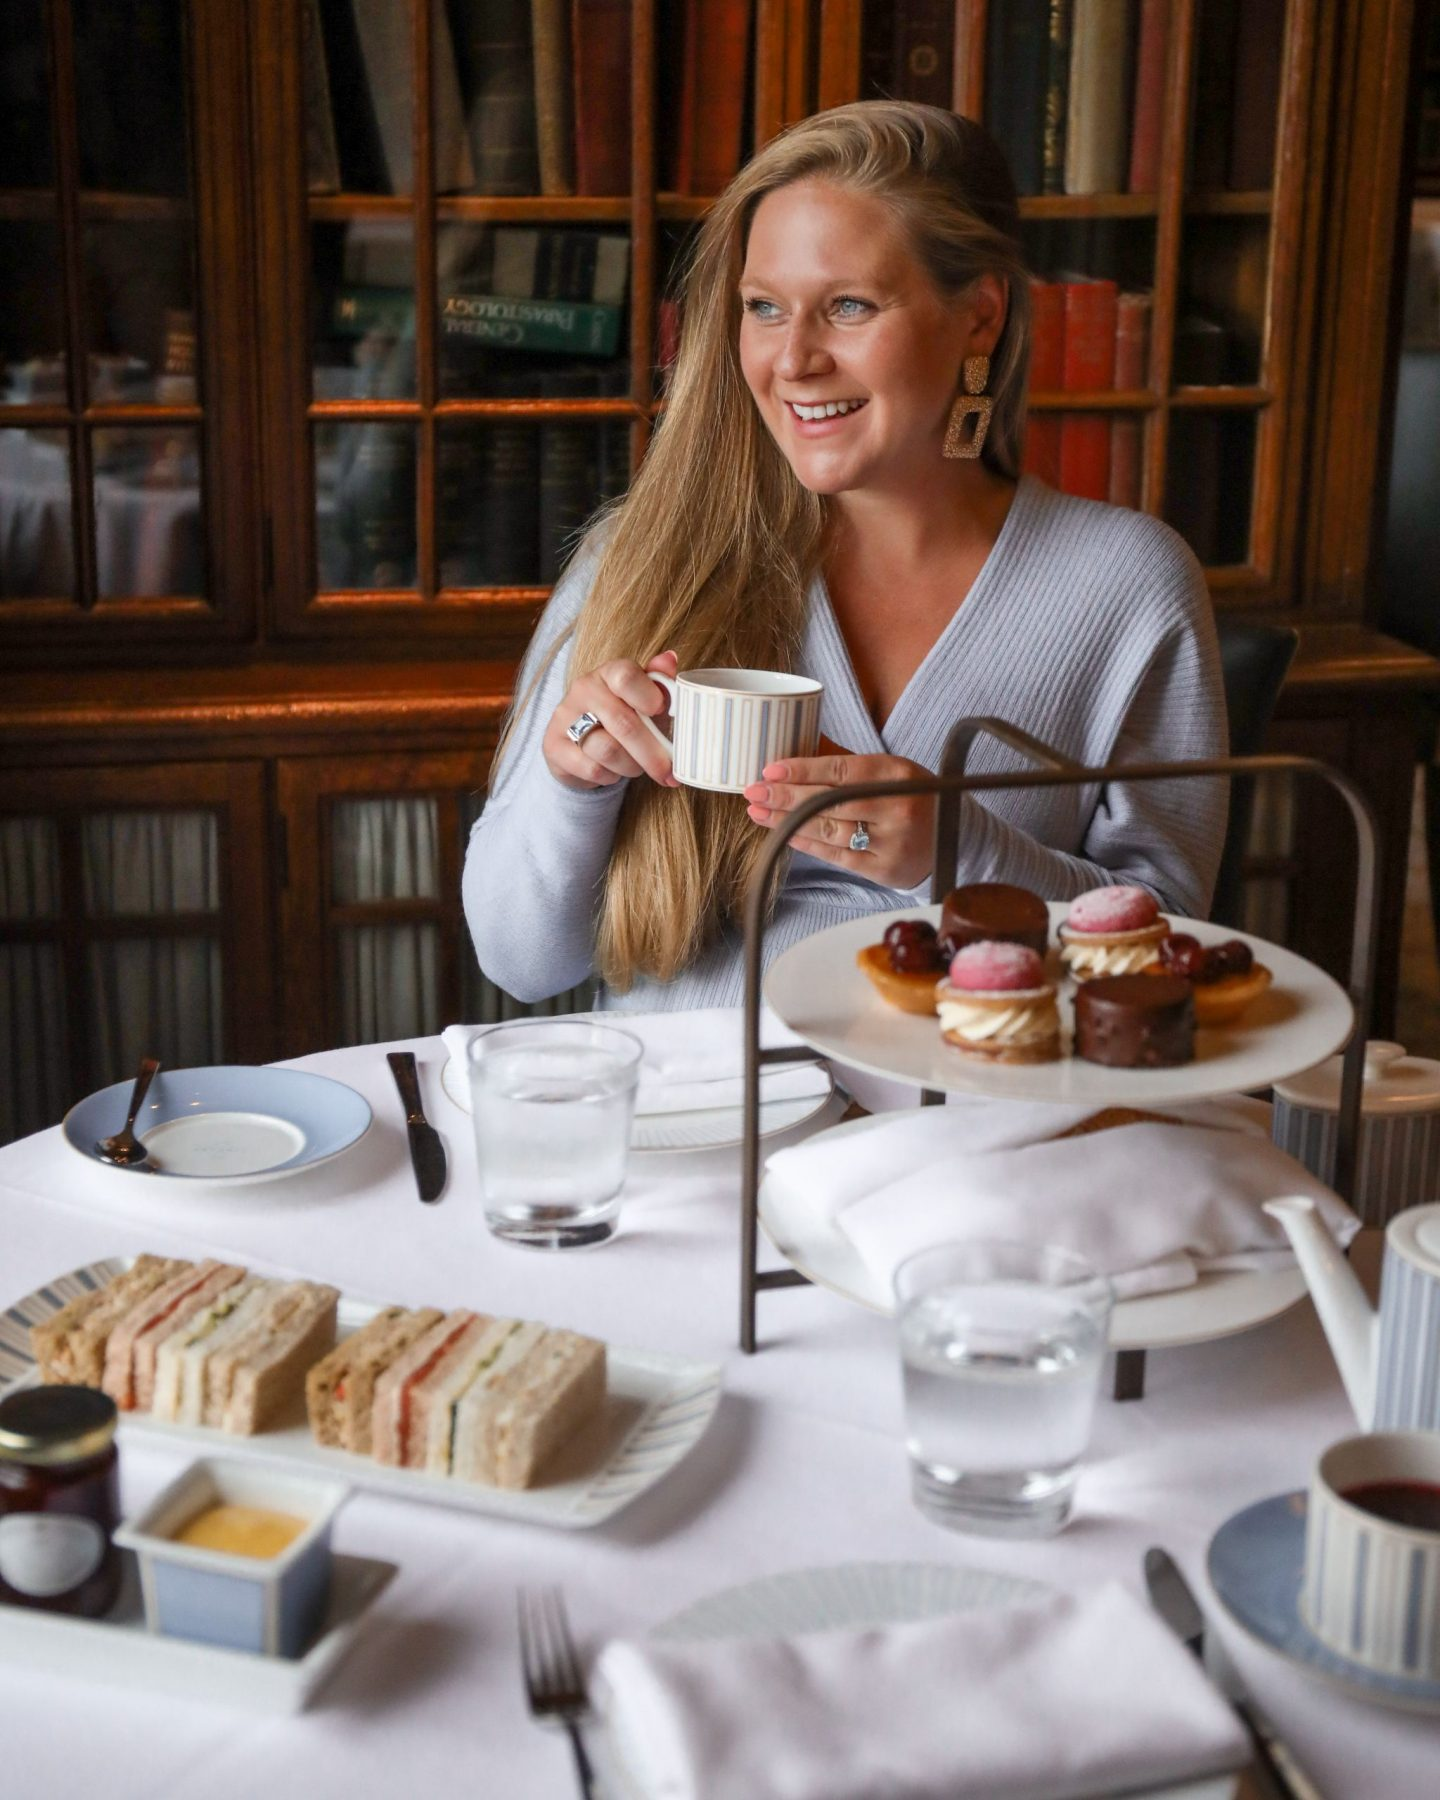 The London Marriott County Hall, The Library Afternoon Tea, Katie Heath, KALANCHOE